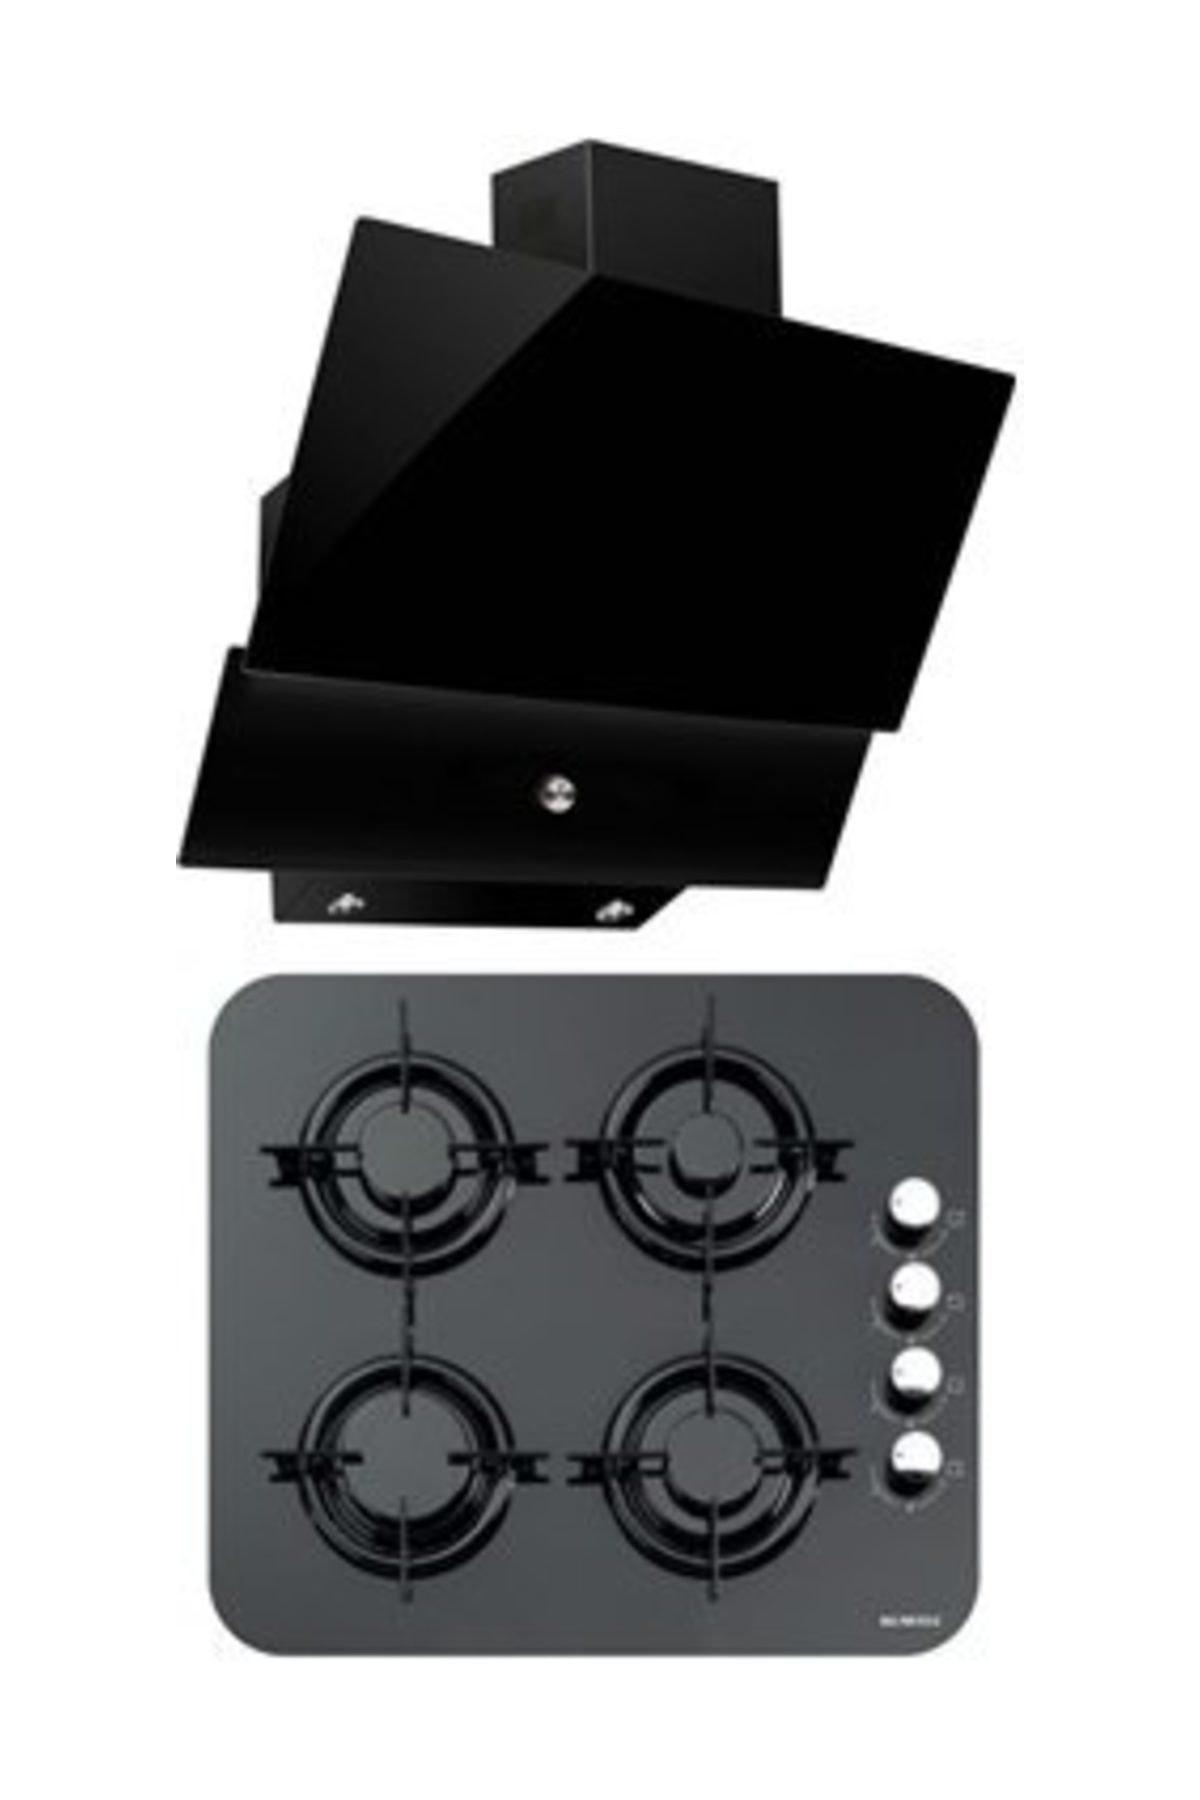 KUMTEL Siyah İkili Oval Cam Ankastre Set (DA6 830 Davlumbaz + 40 TSHDF Oval Cam Ocak) 1